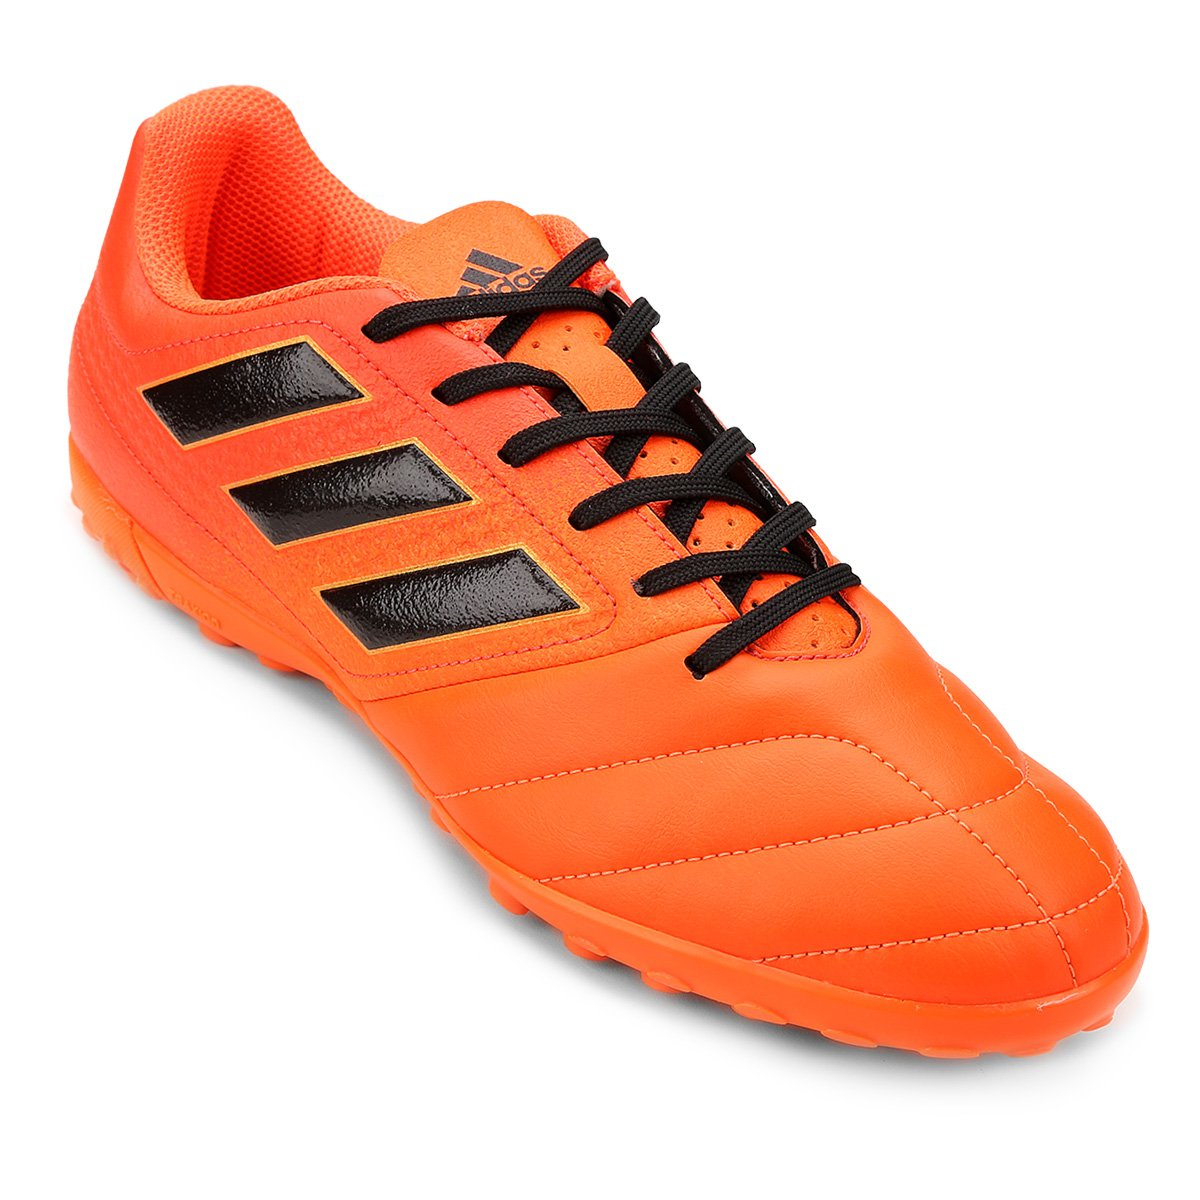 99c2431121b0e Chuteira Society Adidas Ace 17.4 TF - Laranja - Compre Agora